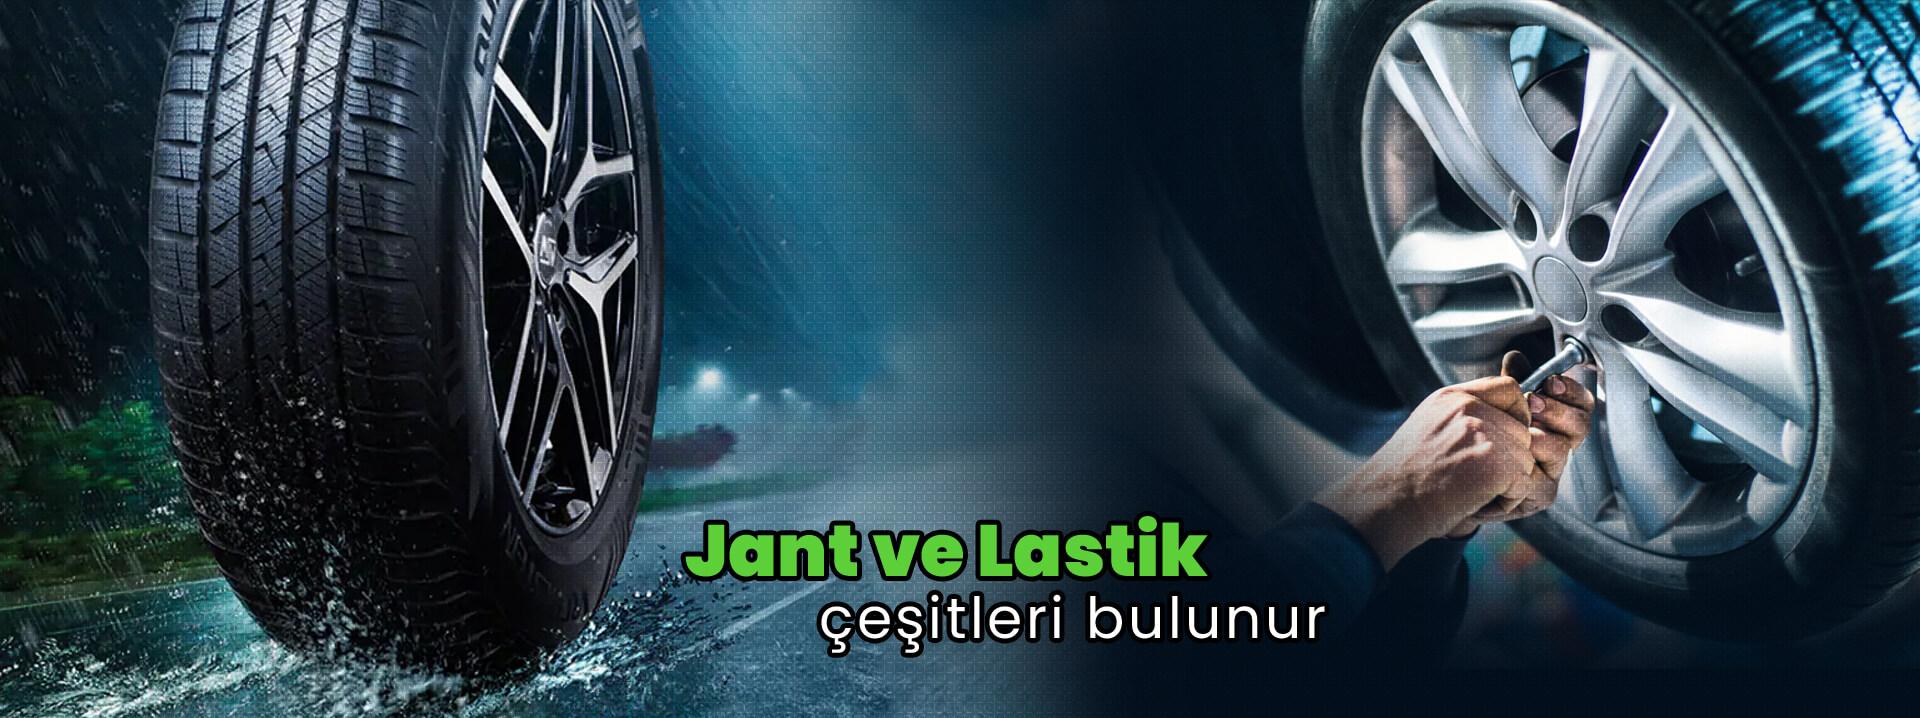 www sakaryalastik com